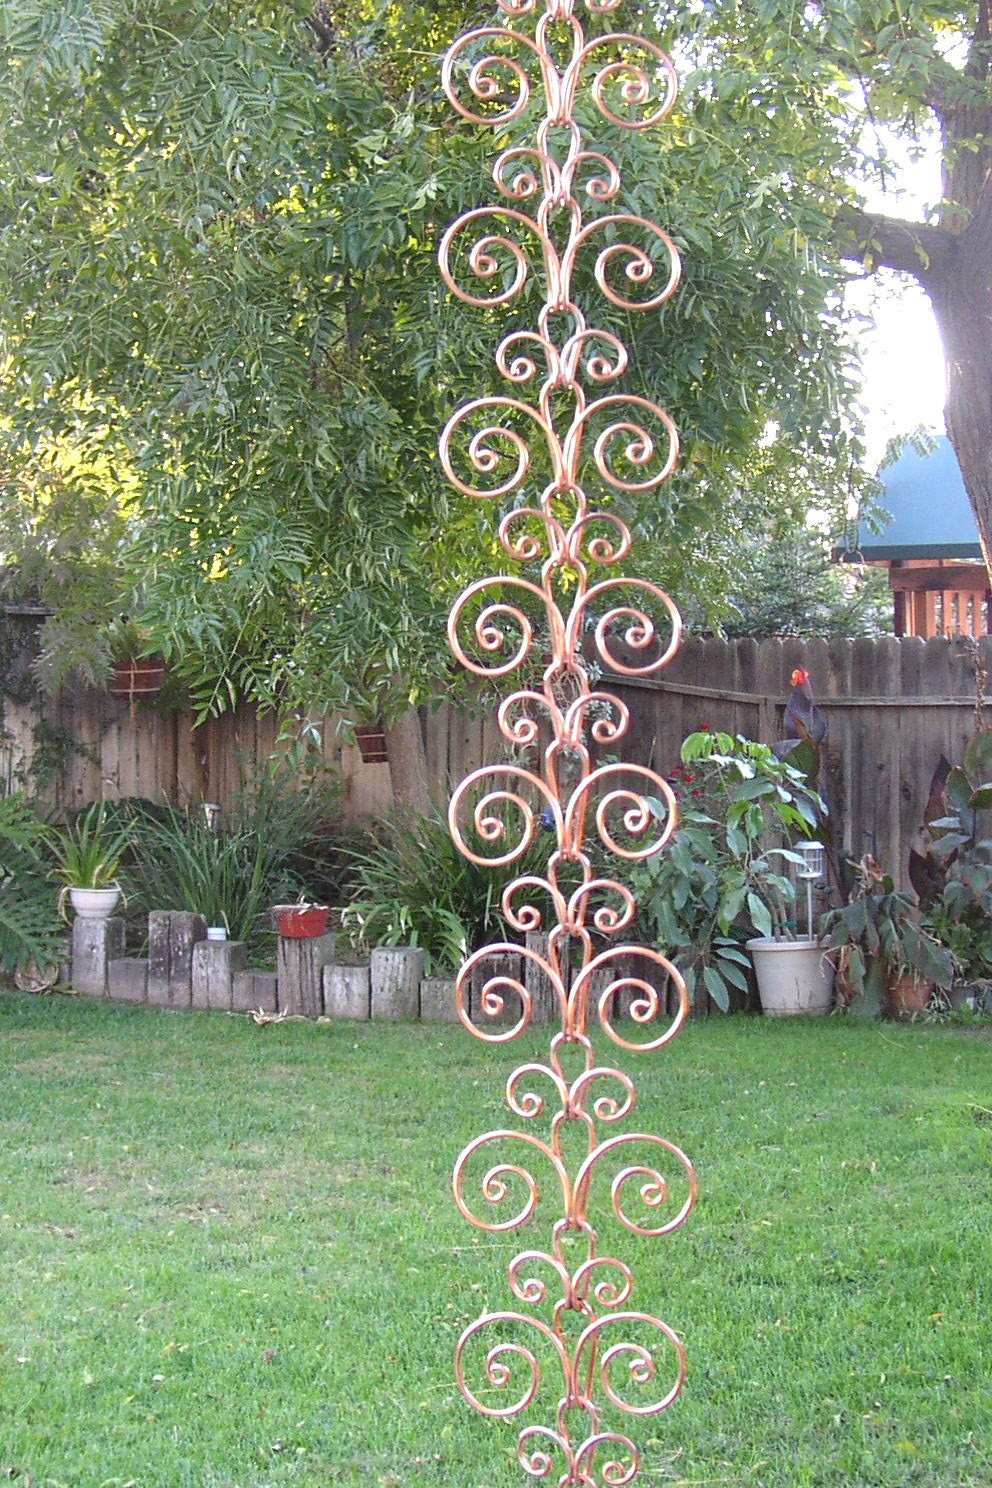 Solid Copper Swirl Rain Chain By Twistsonwire On Etsy